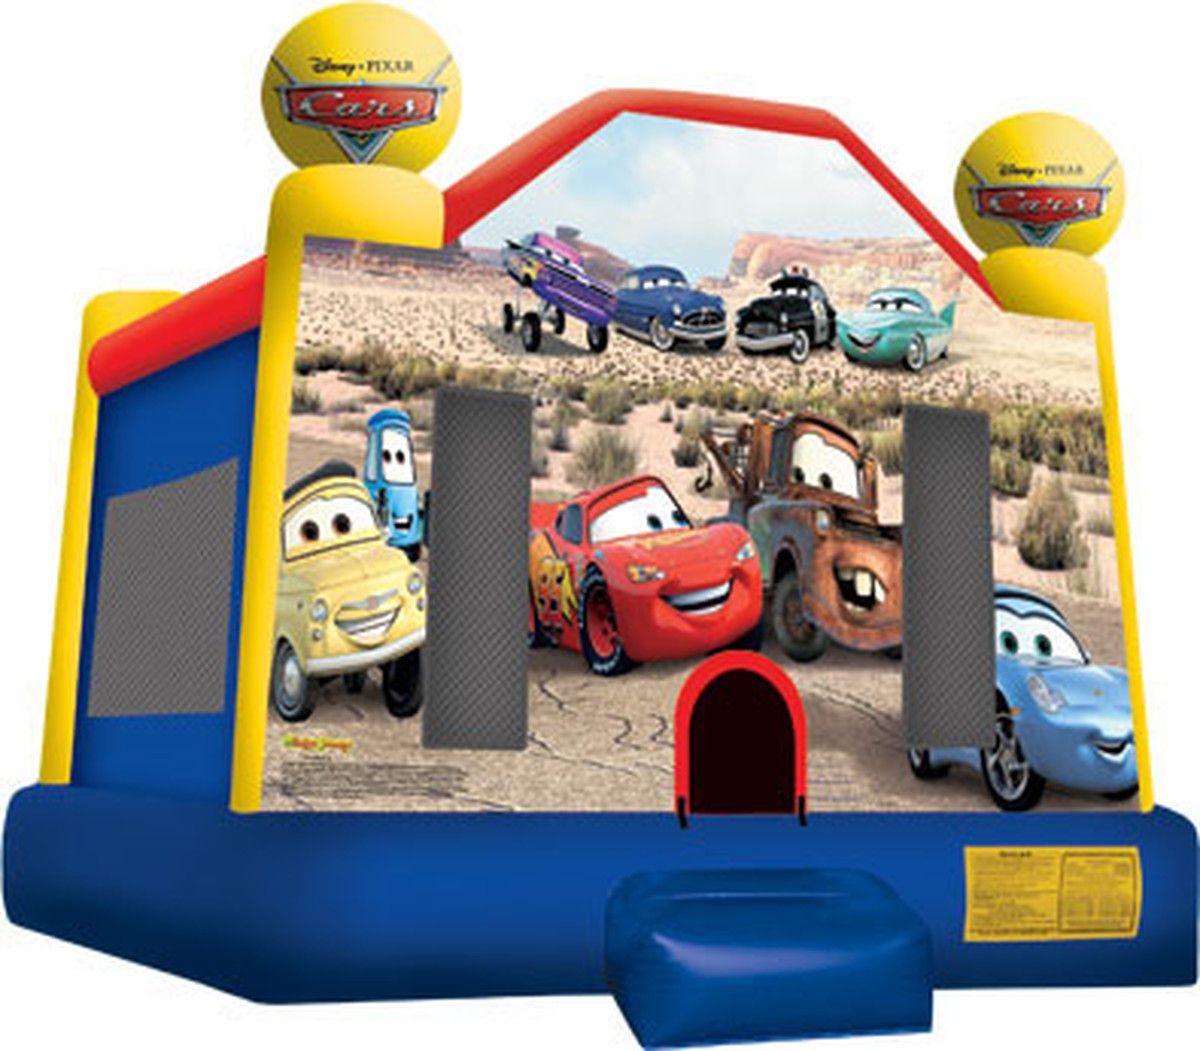 Cars bounce house full face inflatable bounce house